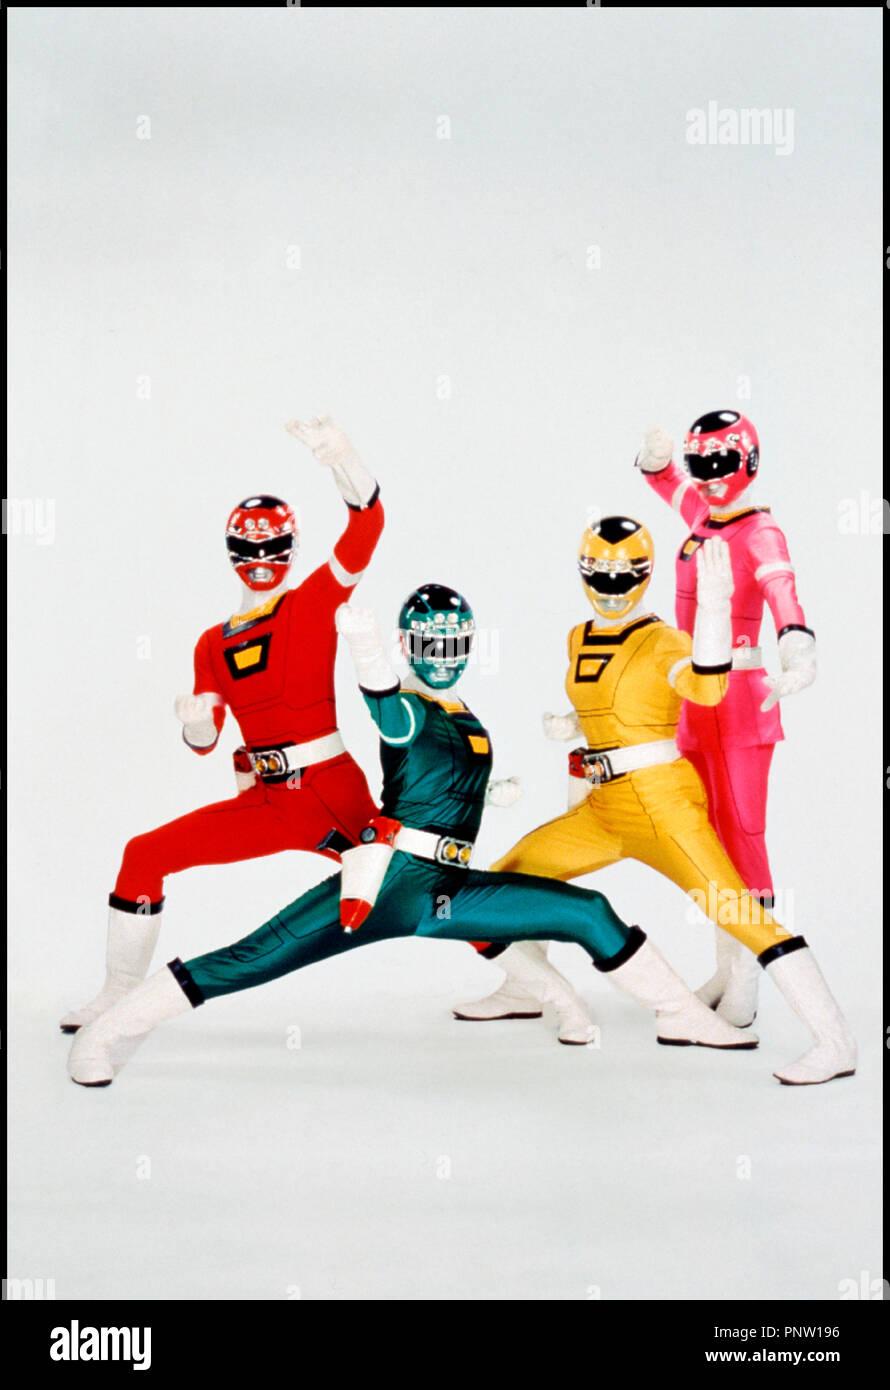 Power Rangers Turbo Stock Photos & Power Rangers Turbo Stock Images